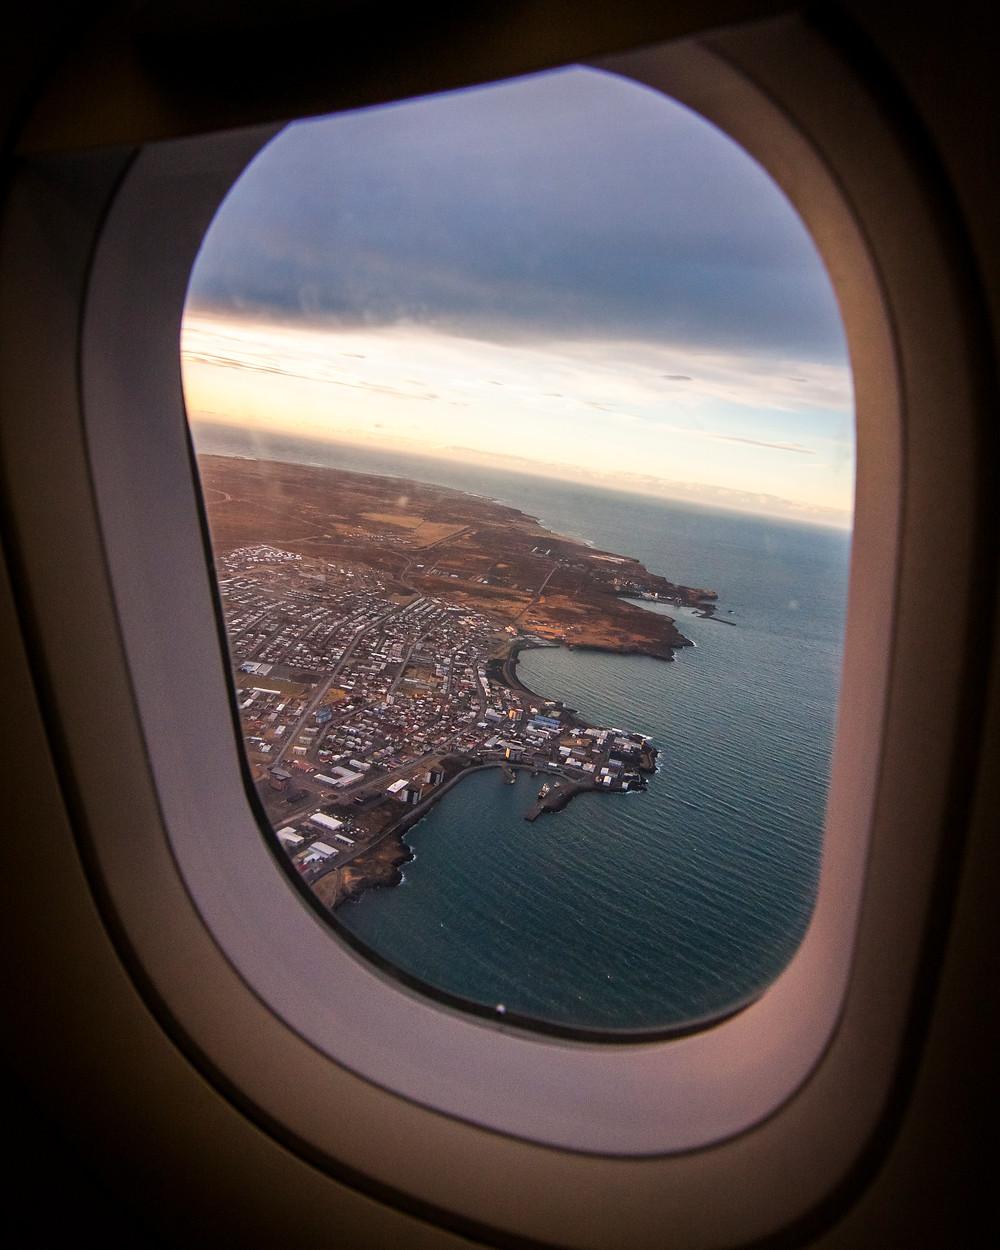 Flying Over Keflavik at Sunset